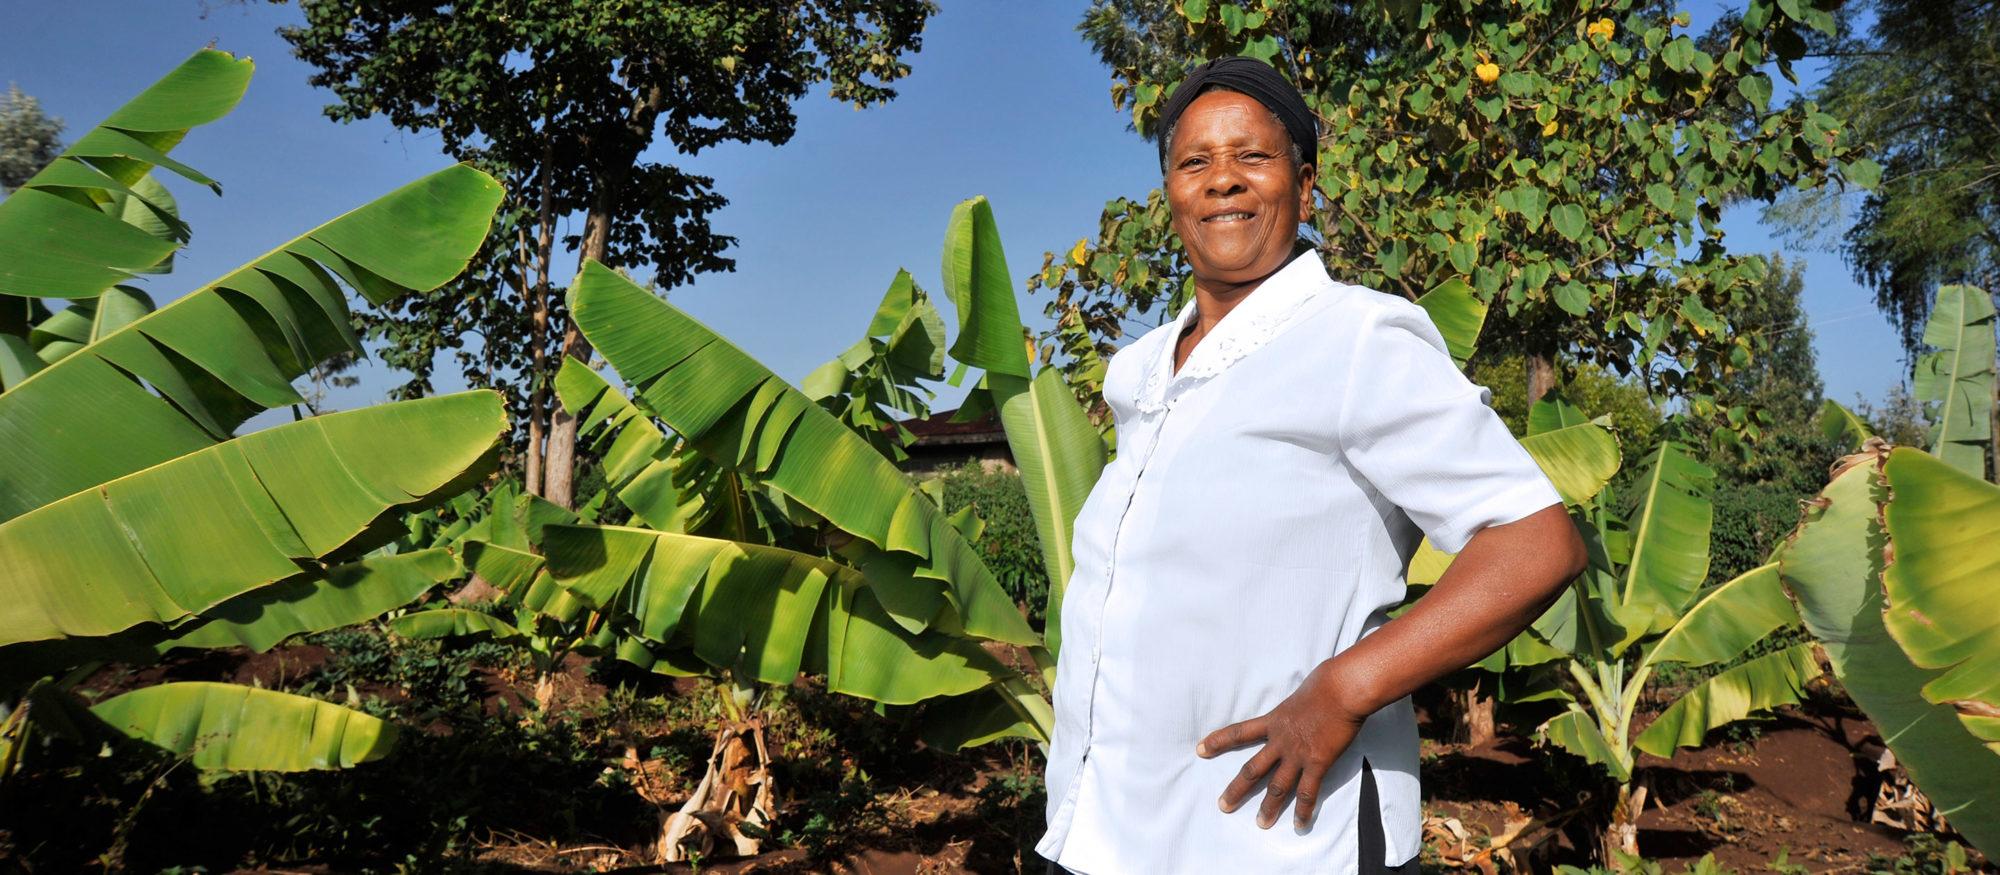 Mercy Njoki Gathiongo poserar framför en bananodling, leende.